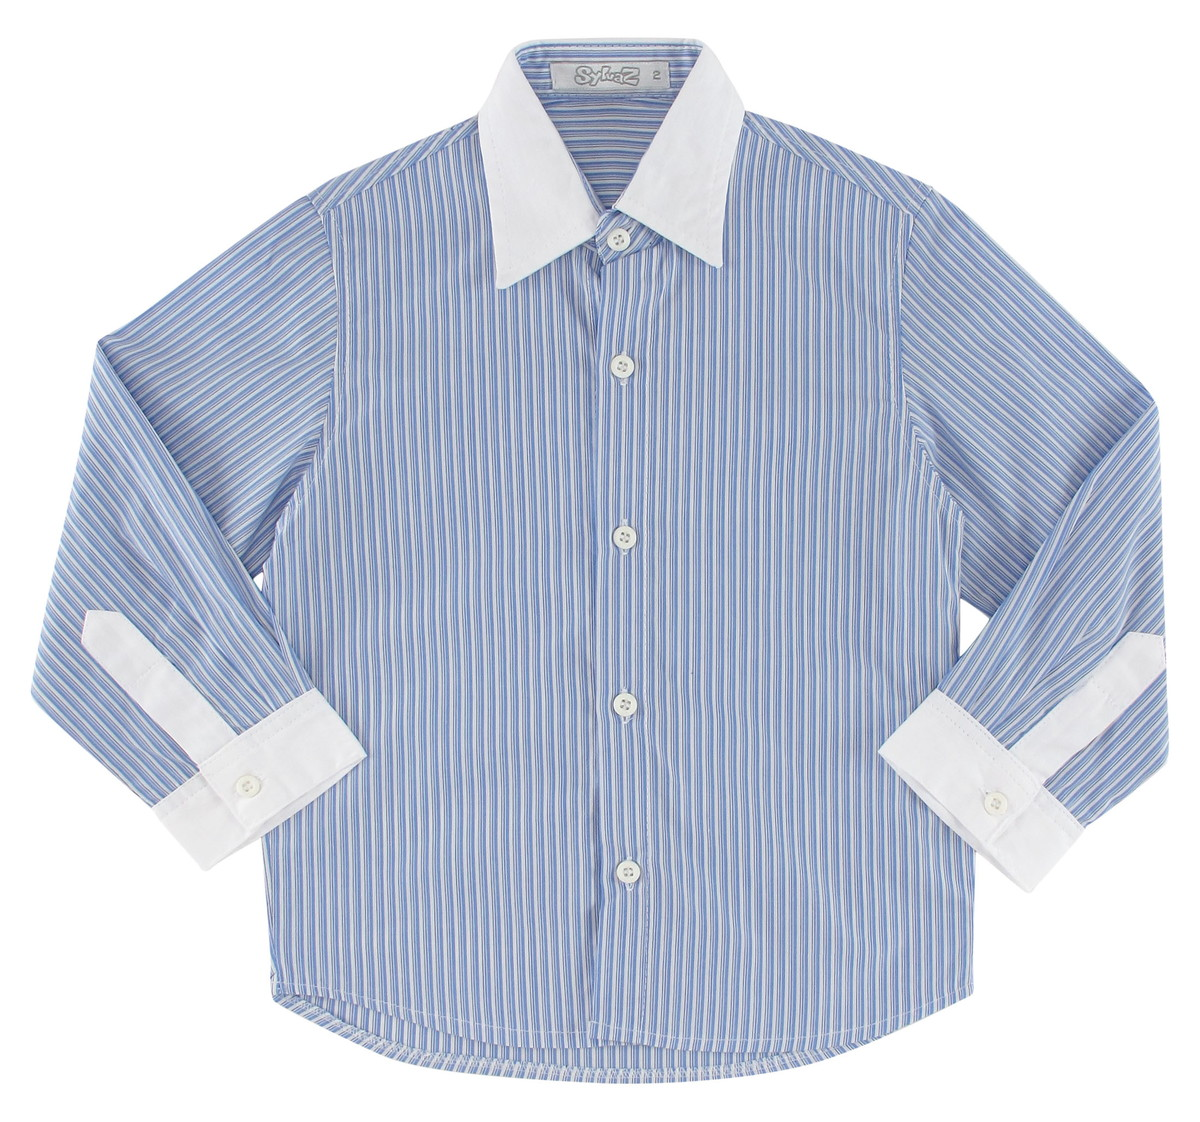 6dcc8d3ab Camisa Social Infantil Manga Longa no Elo7